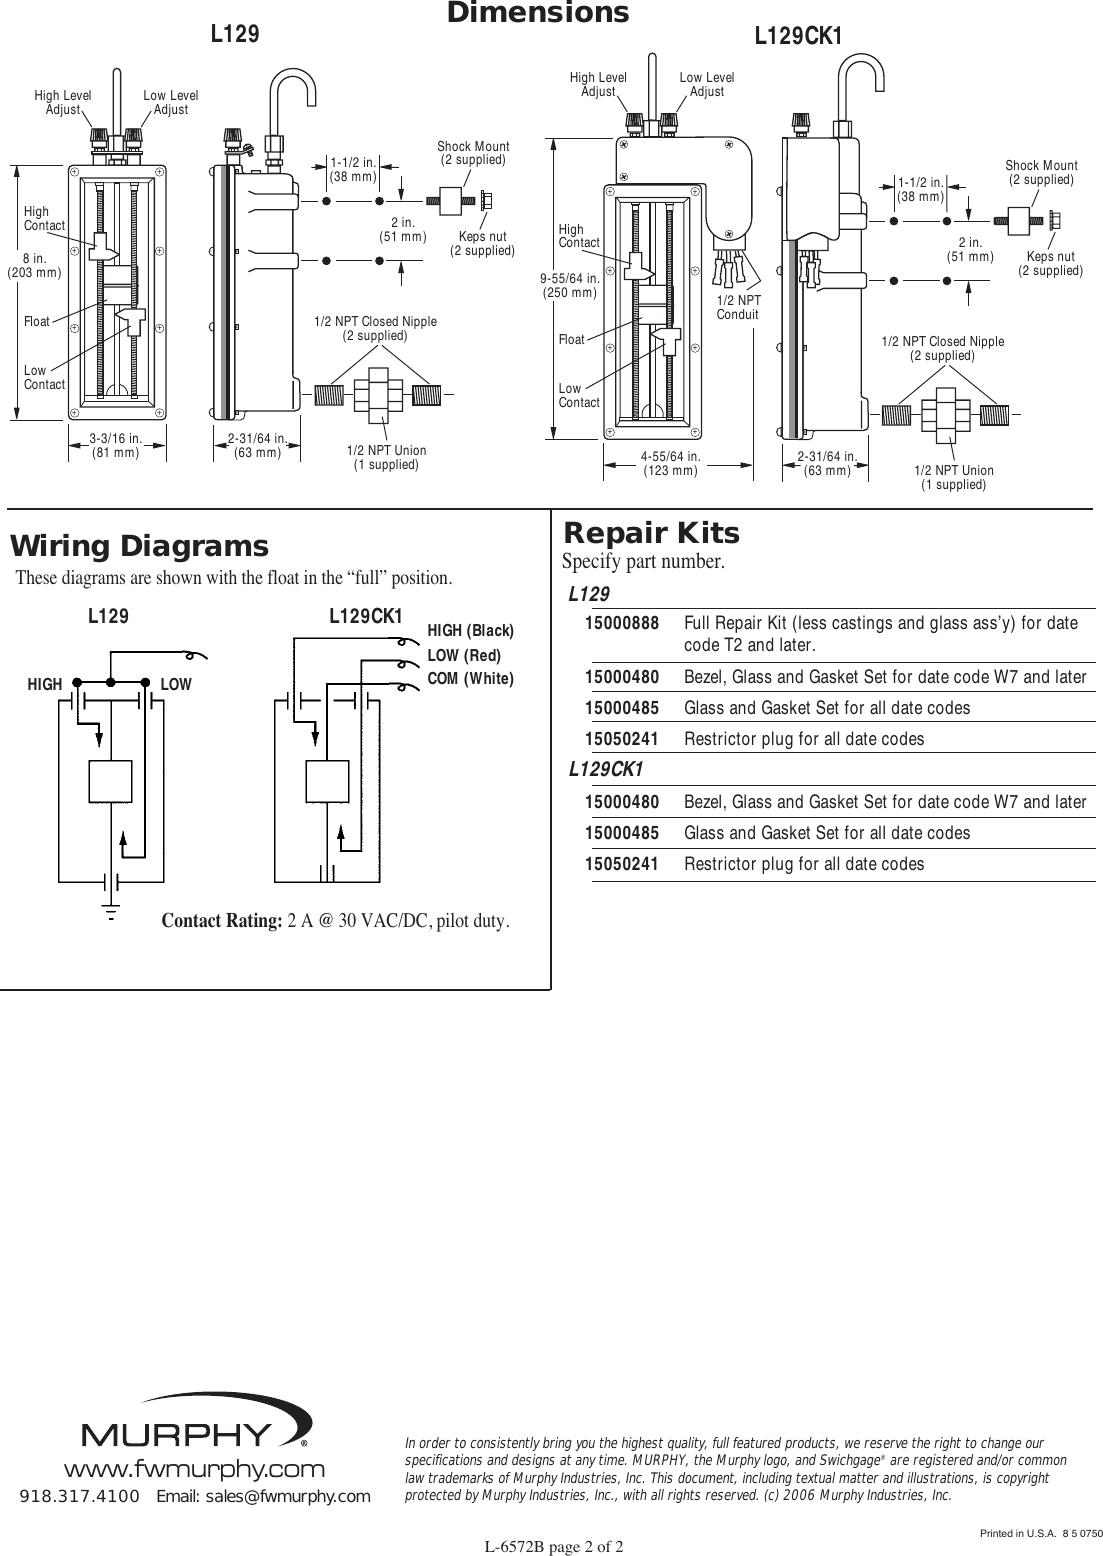 Wiring Diagram Murphy Swichgage